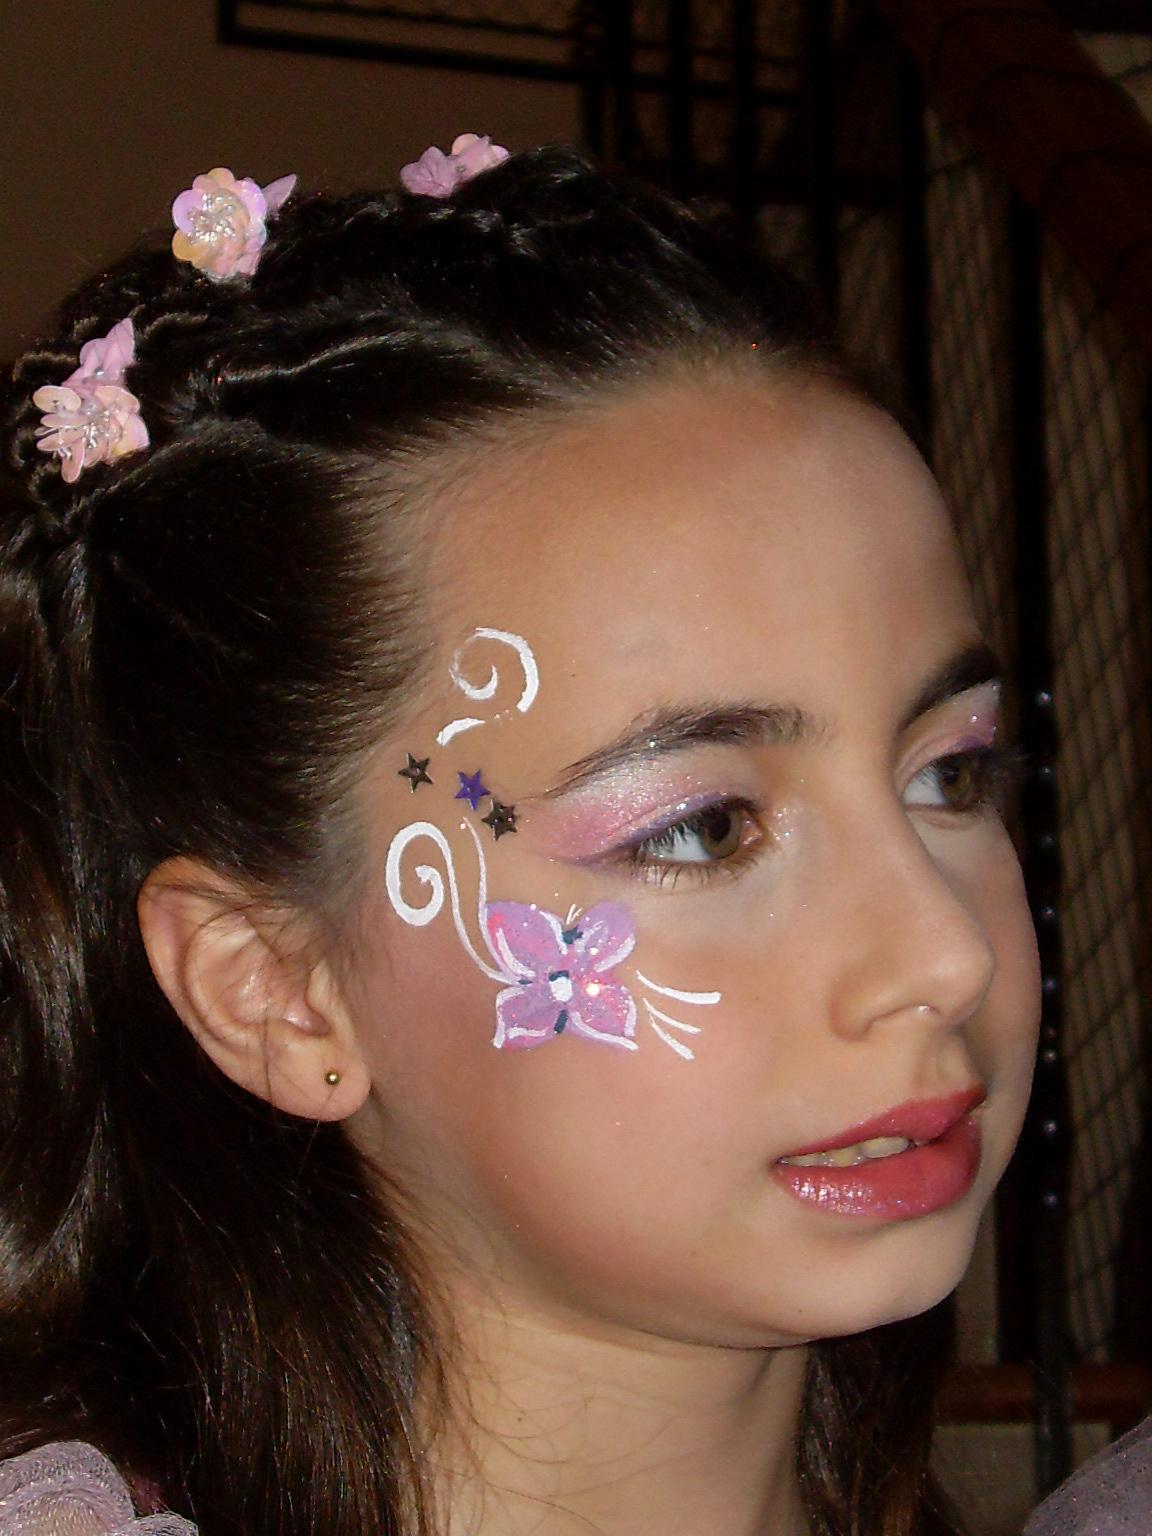 Amscan 243211 frozen 2 birthday, mini olaf pinata decoration, 5 x 7 x 2, 1 piece. CROMATIKA Maquillaje creativo